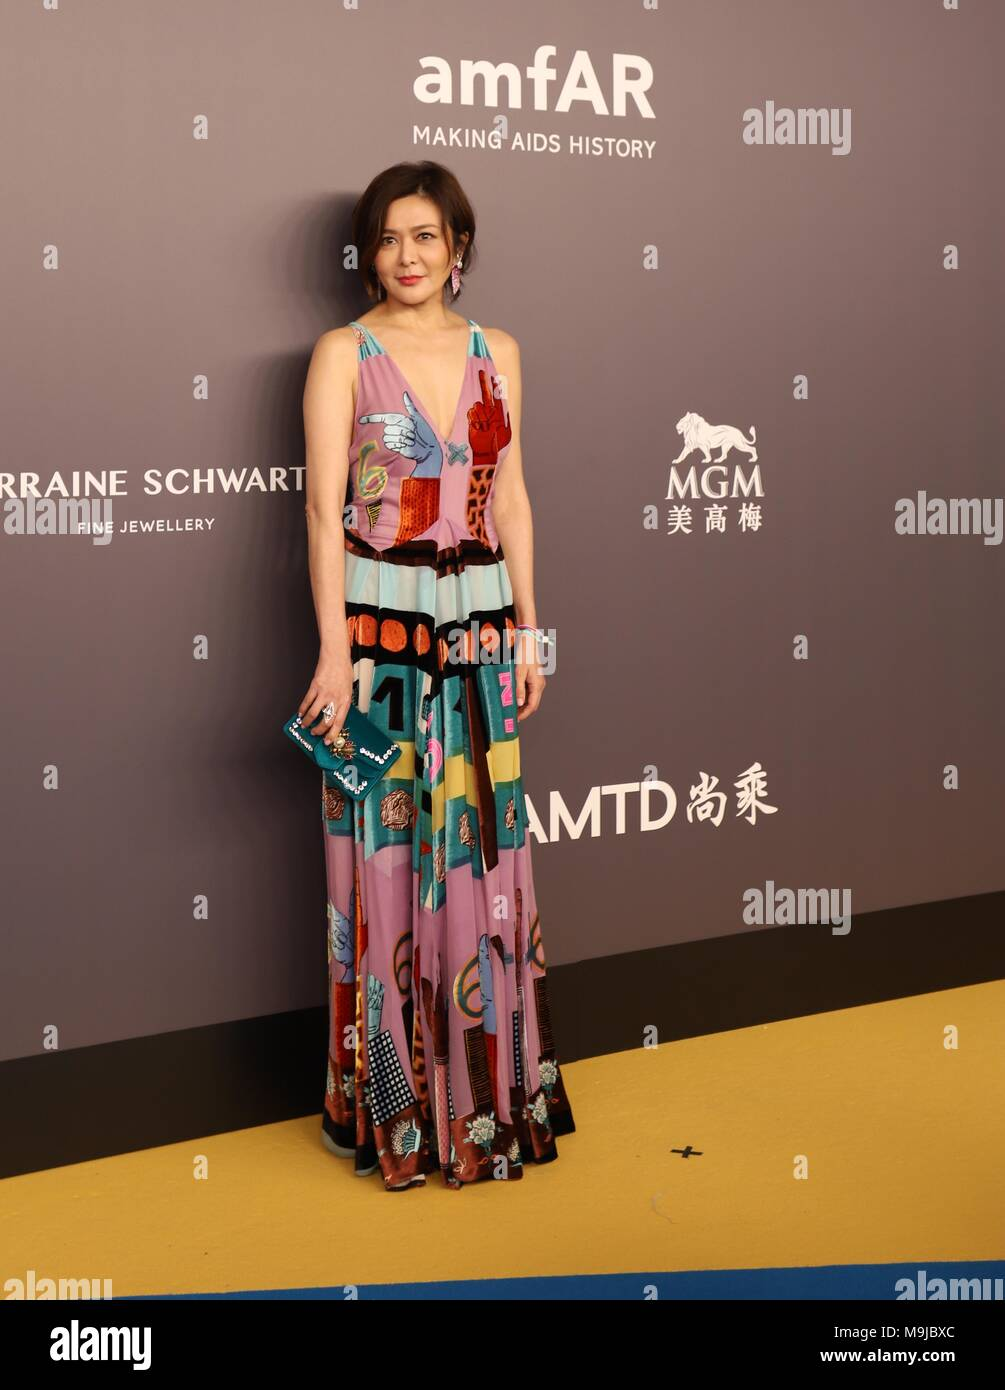 Hong Kong, CHINA. 26th Mar, 2018. Retired celebrity Hong Kong actress, Rosamund Kwan at the annual AMFAR fundraising gala in Hong Kong.Mar-26, 2018 Hong Kong.ZUMA/Liau Chung Ren Credit: Liau Chung Ren/ZUMA Wire/Alamy Live News - Stock Image